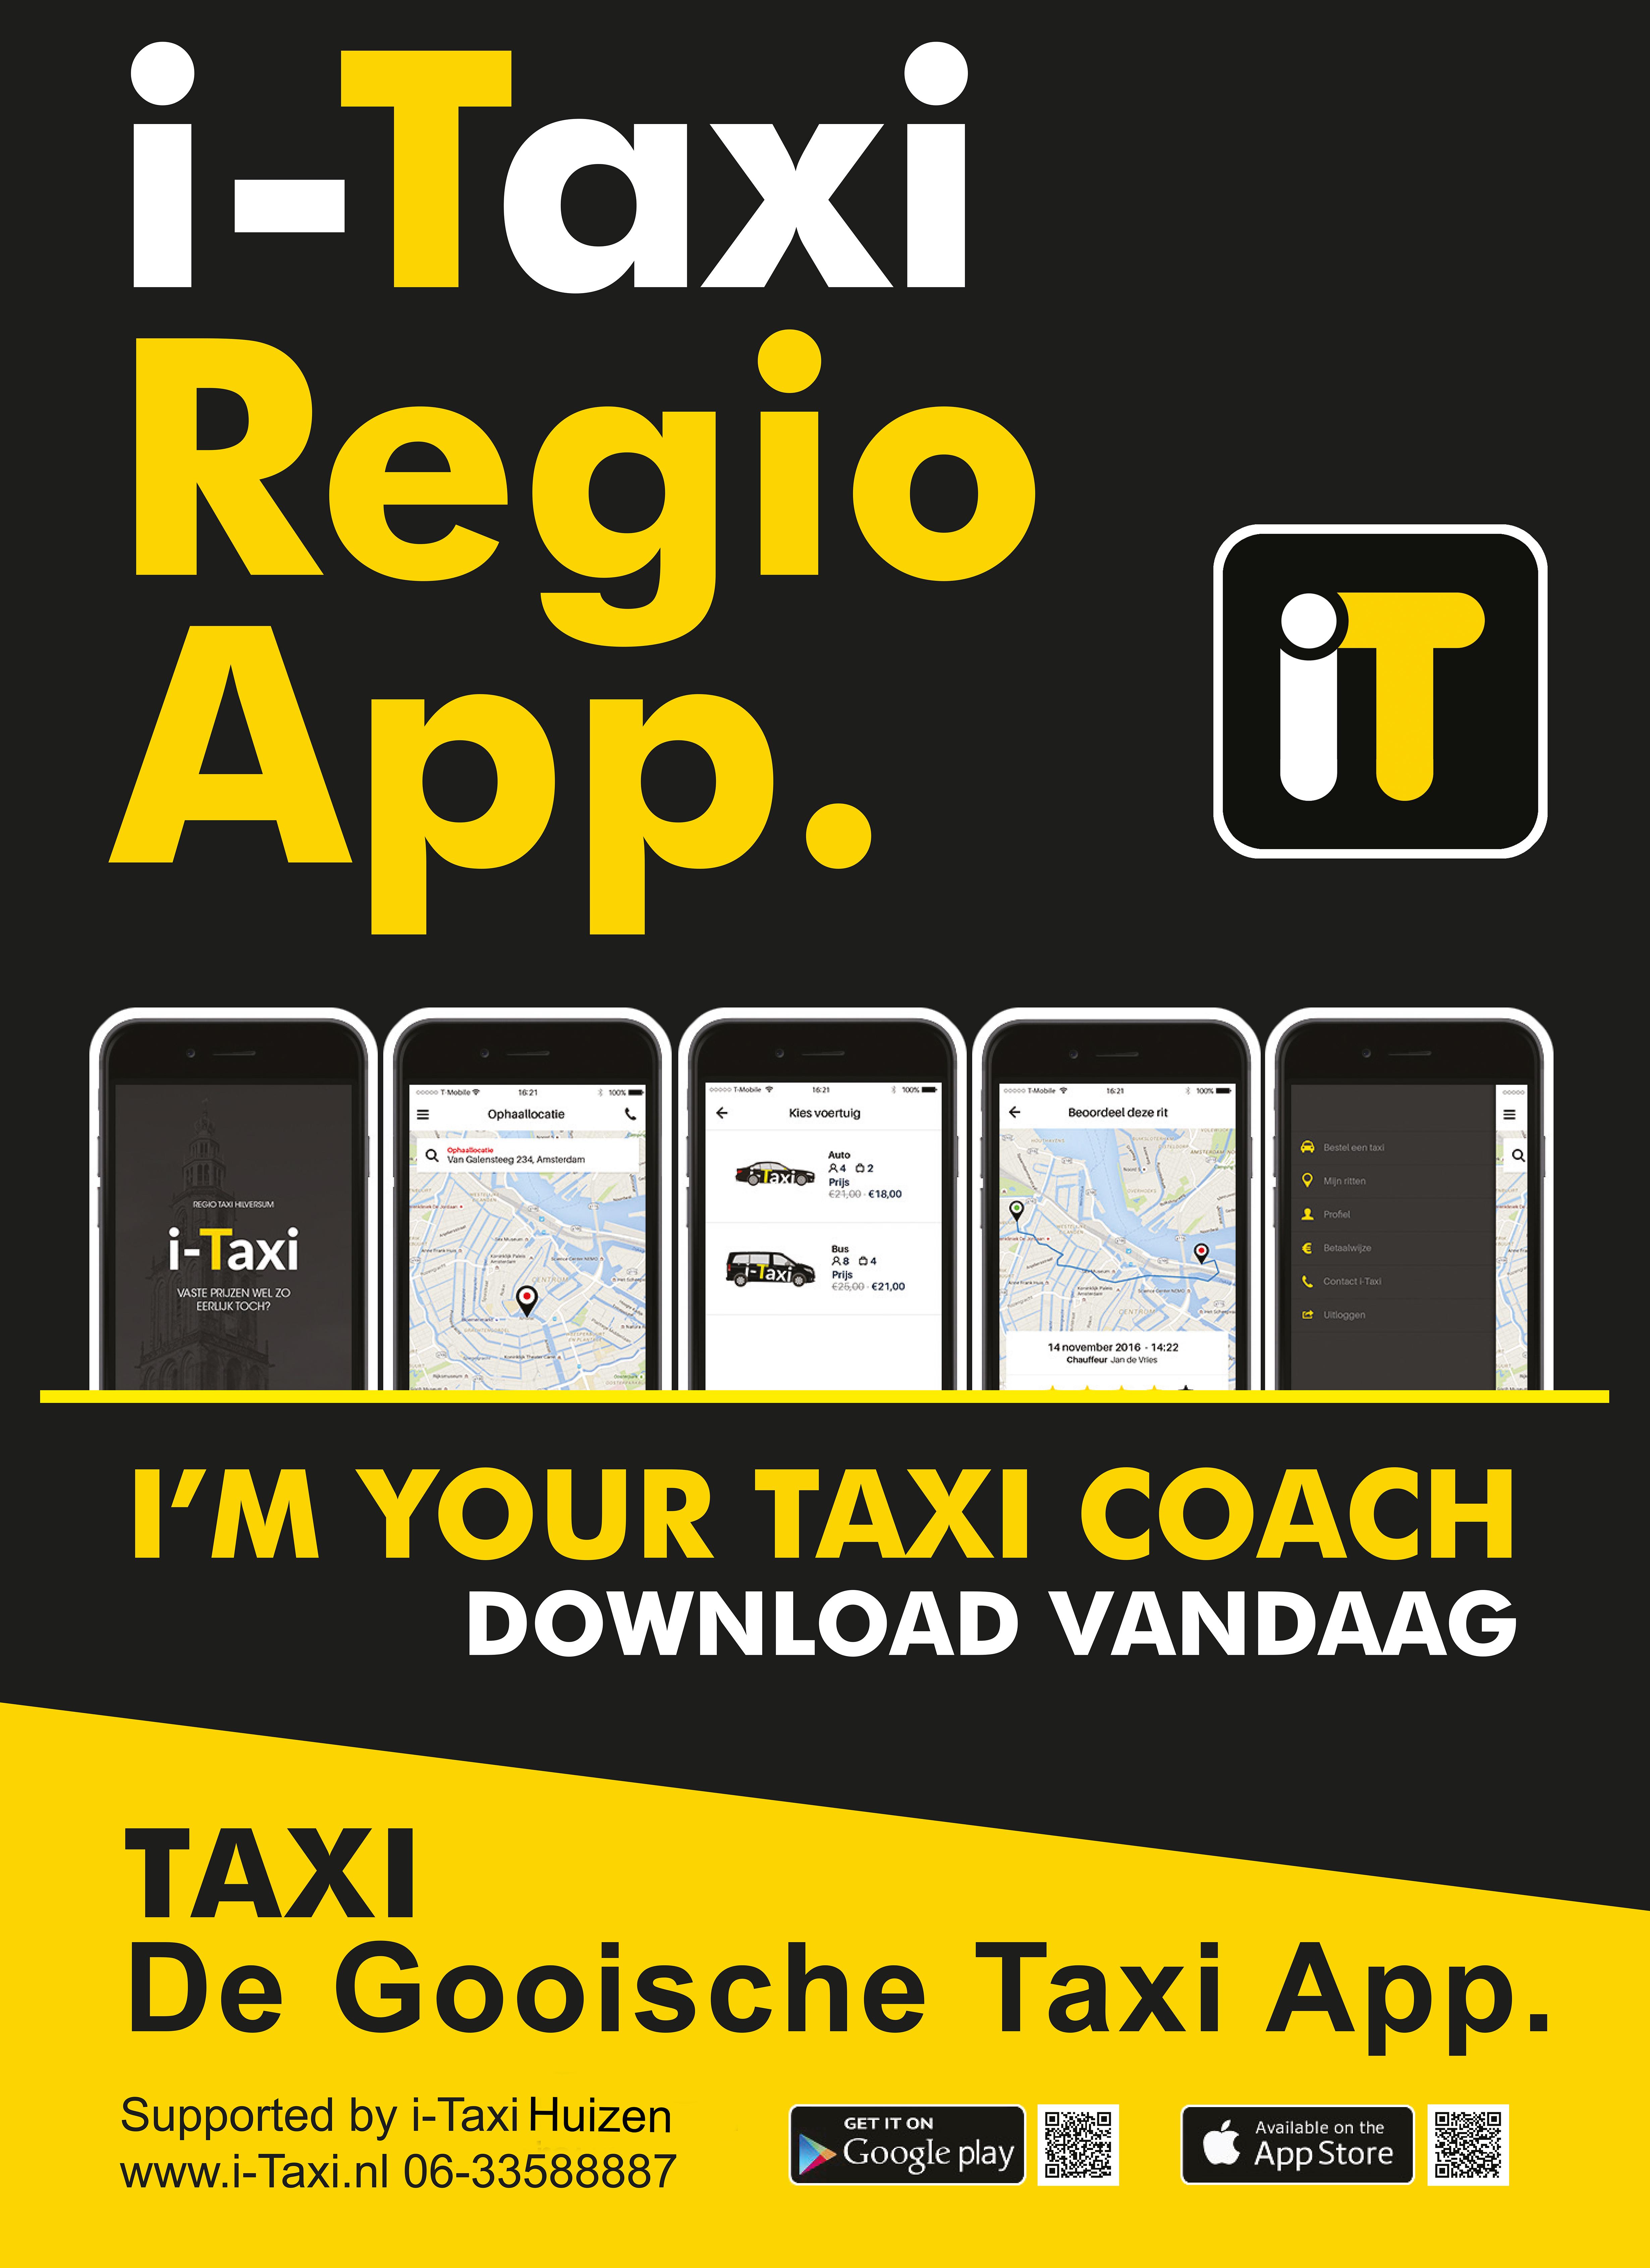 i-taxi huizen